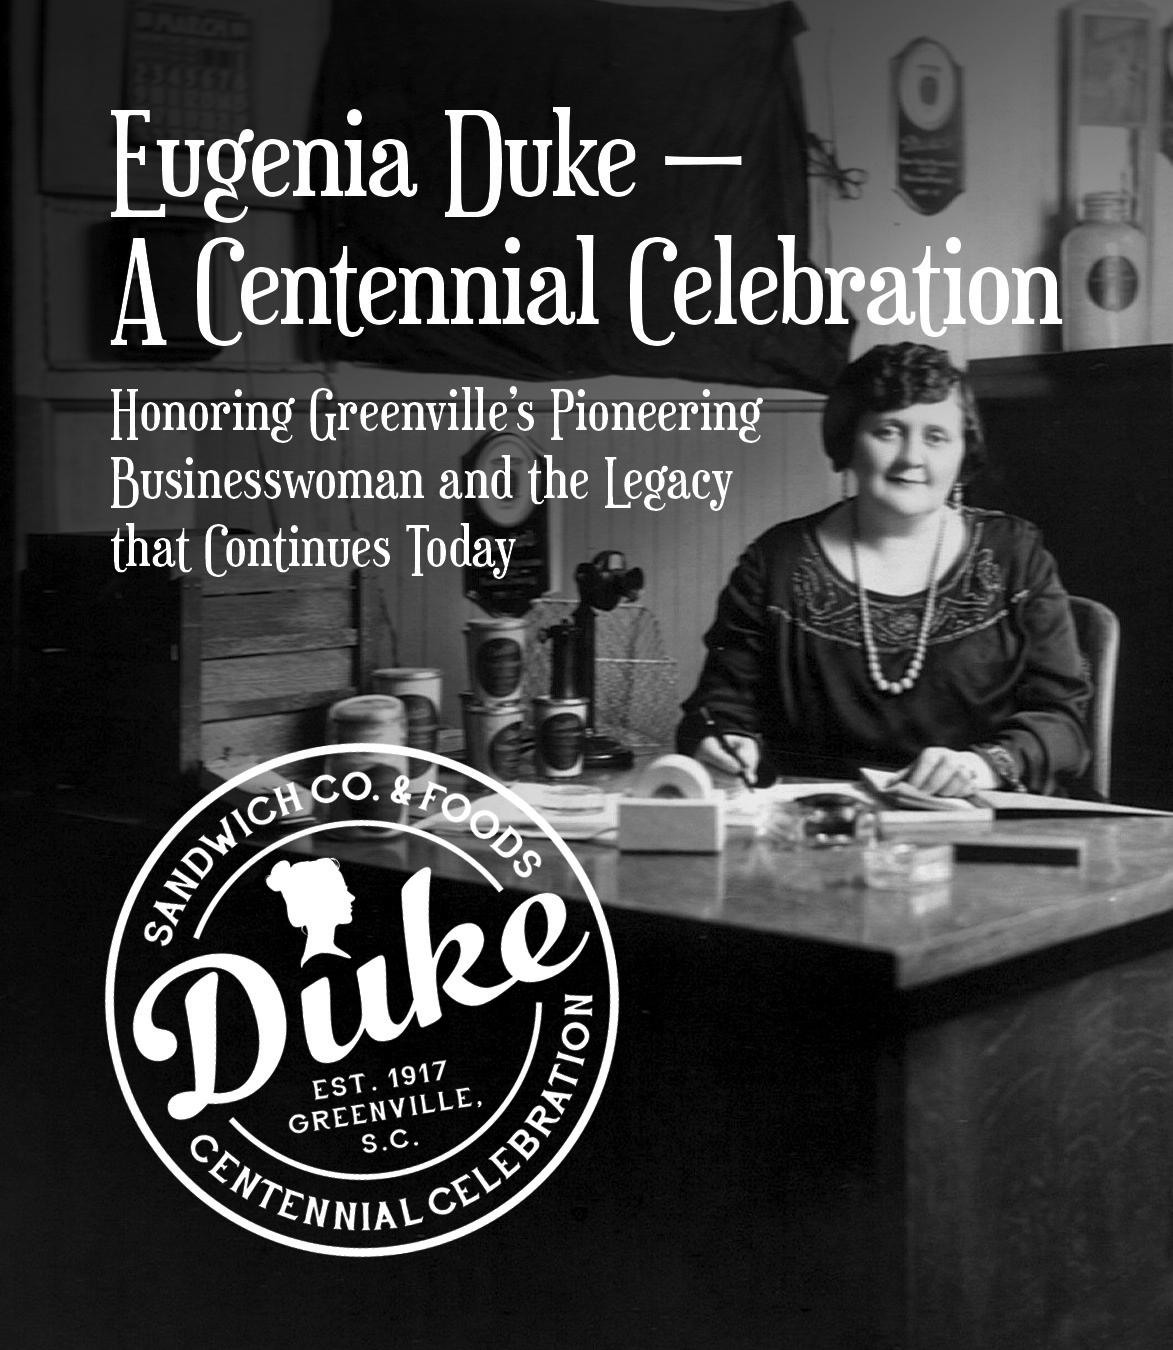 Duke_ad.jpg